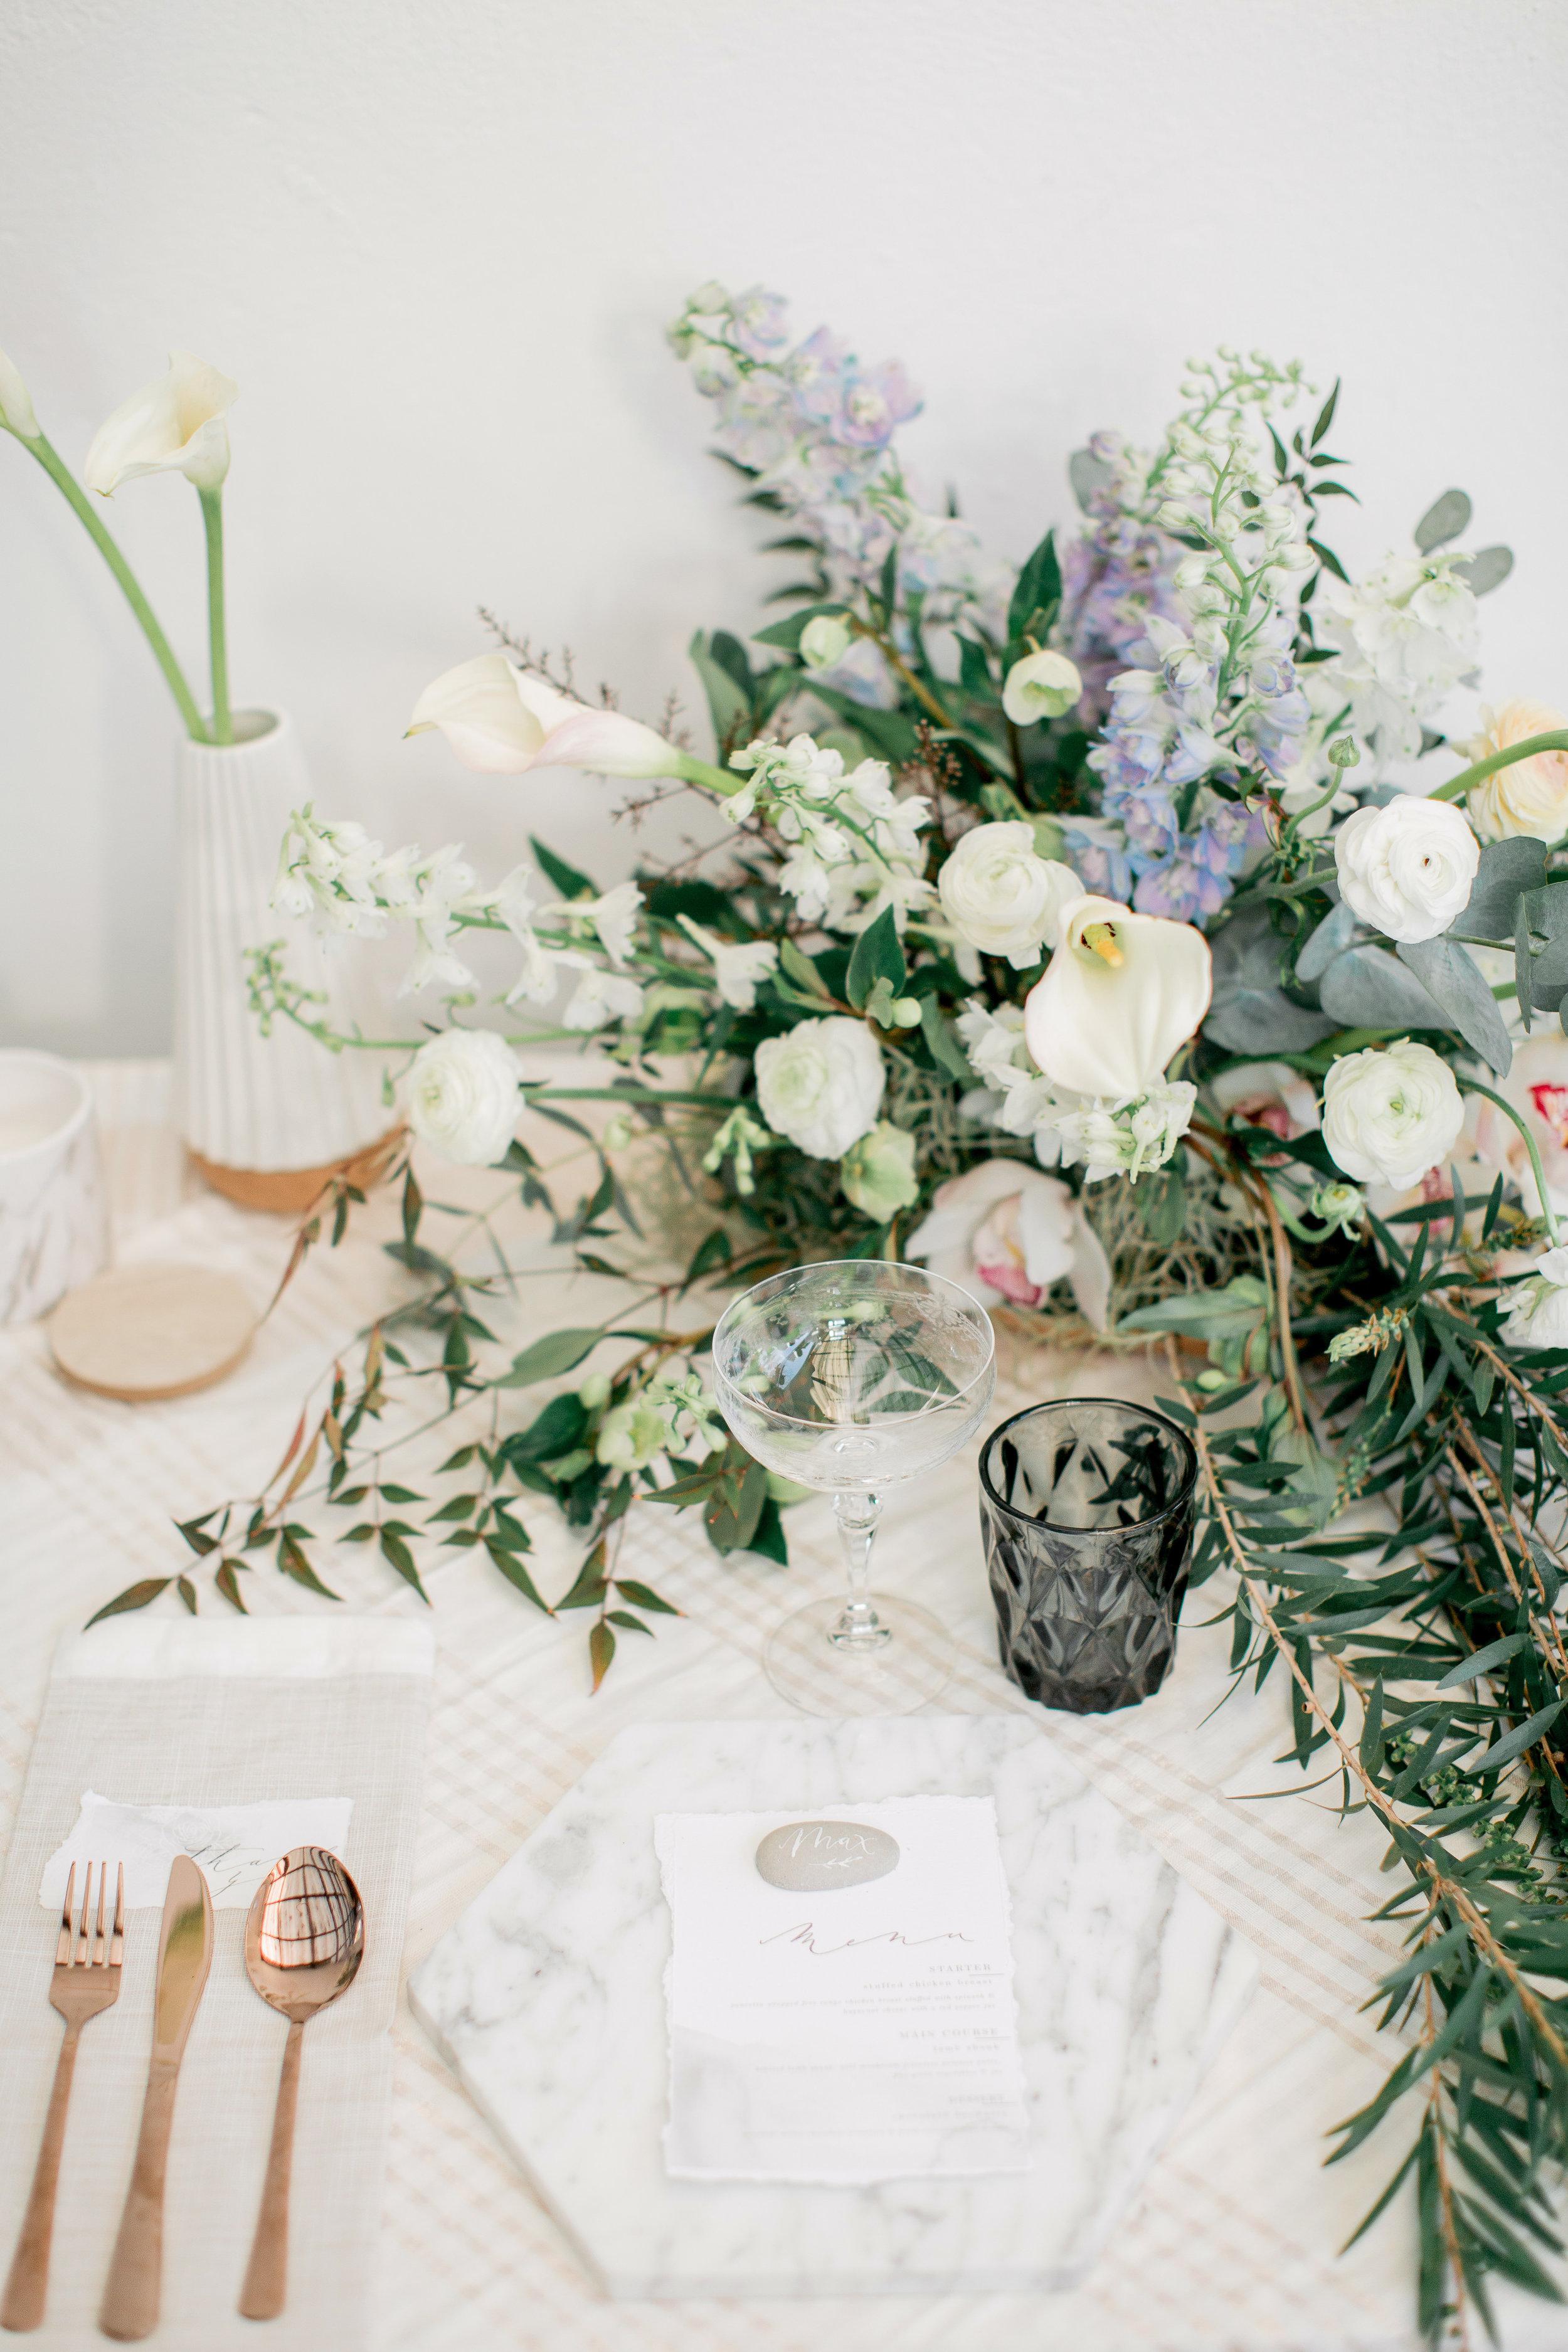 gauteng wedding photographer clareece smit02.jpg